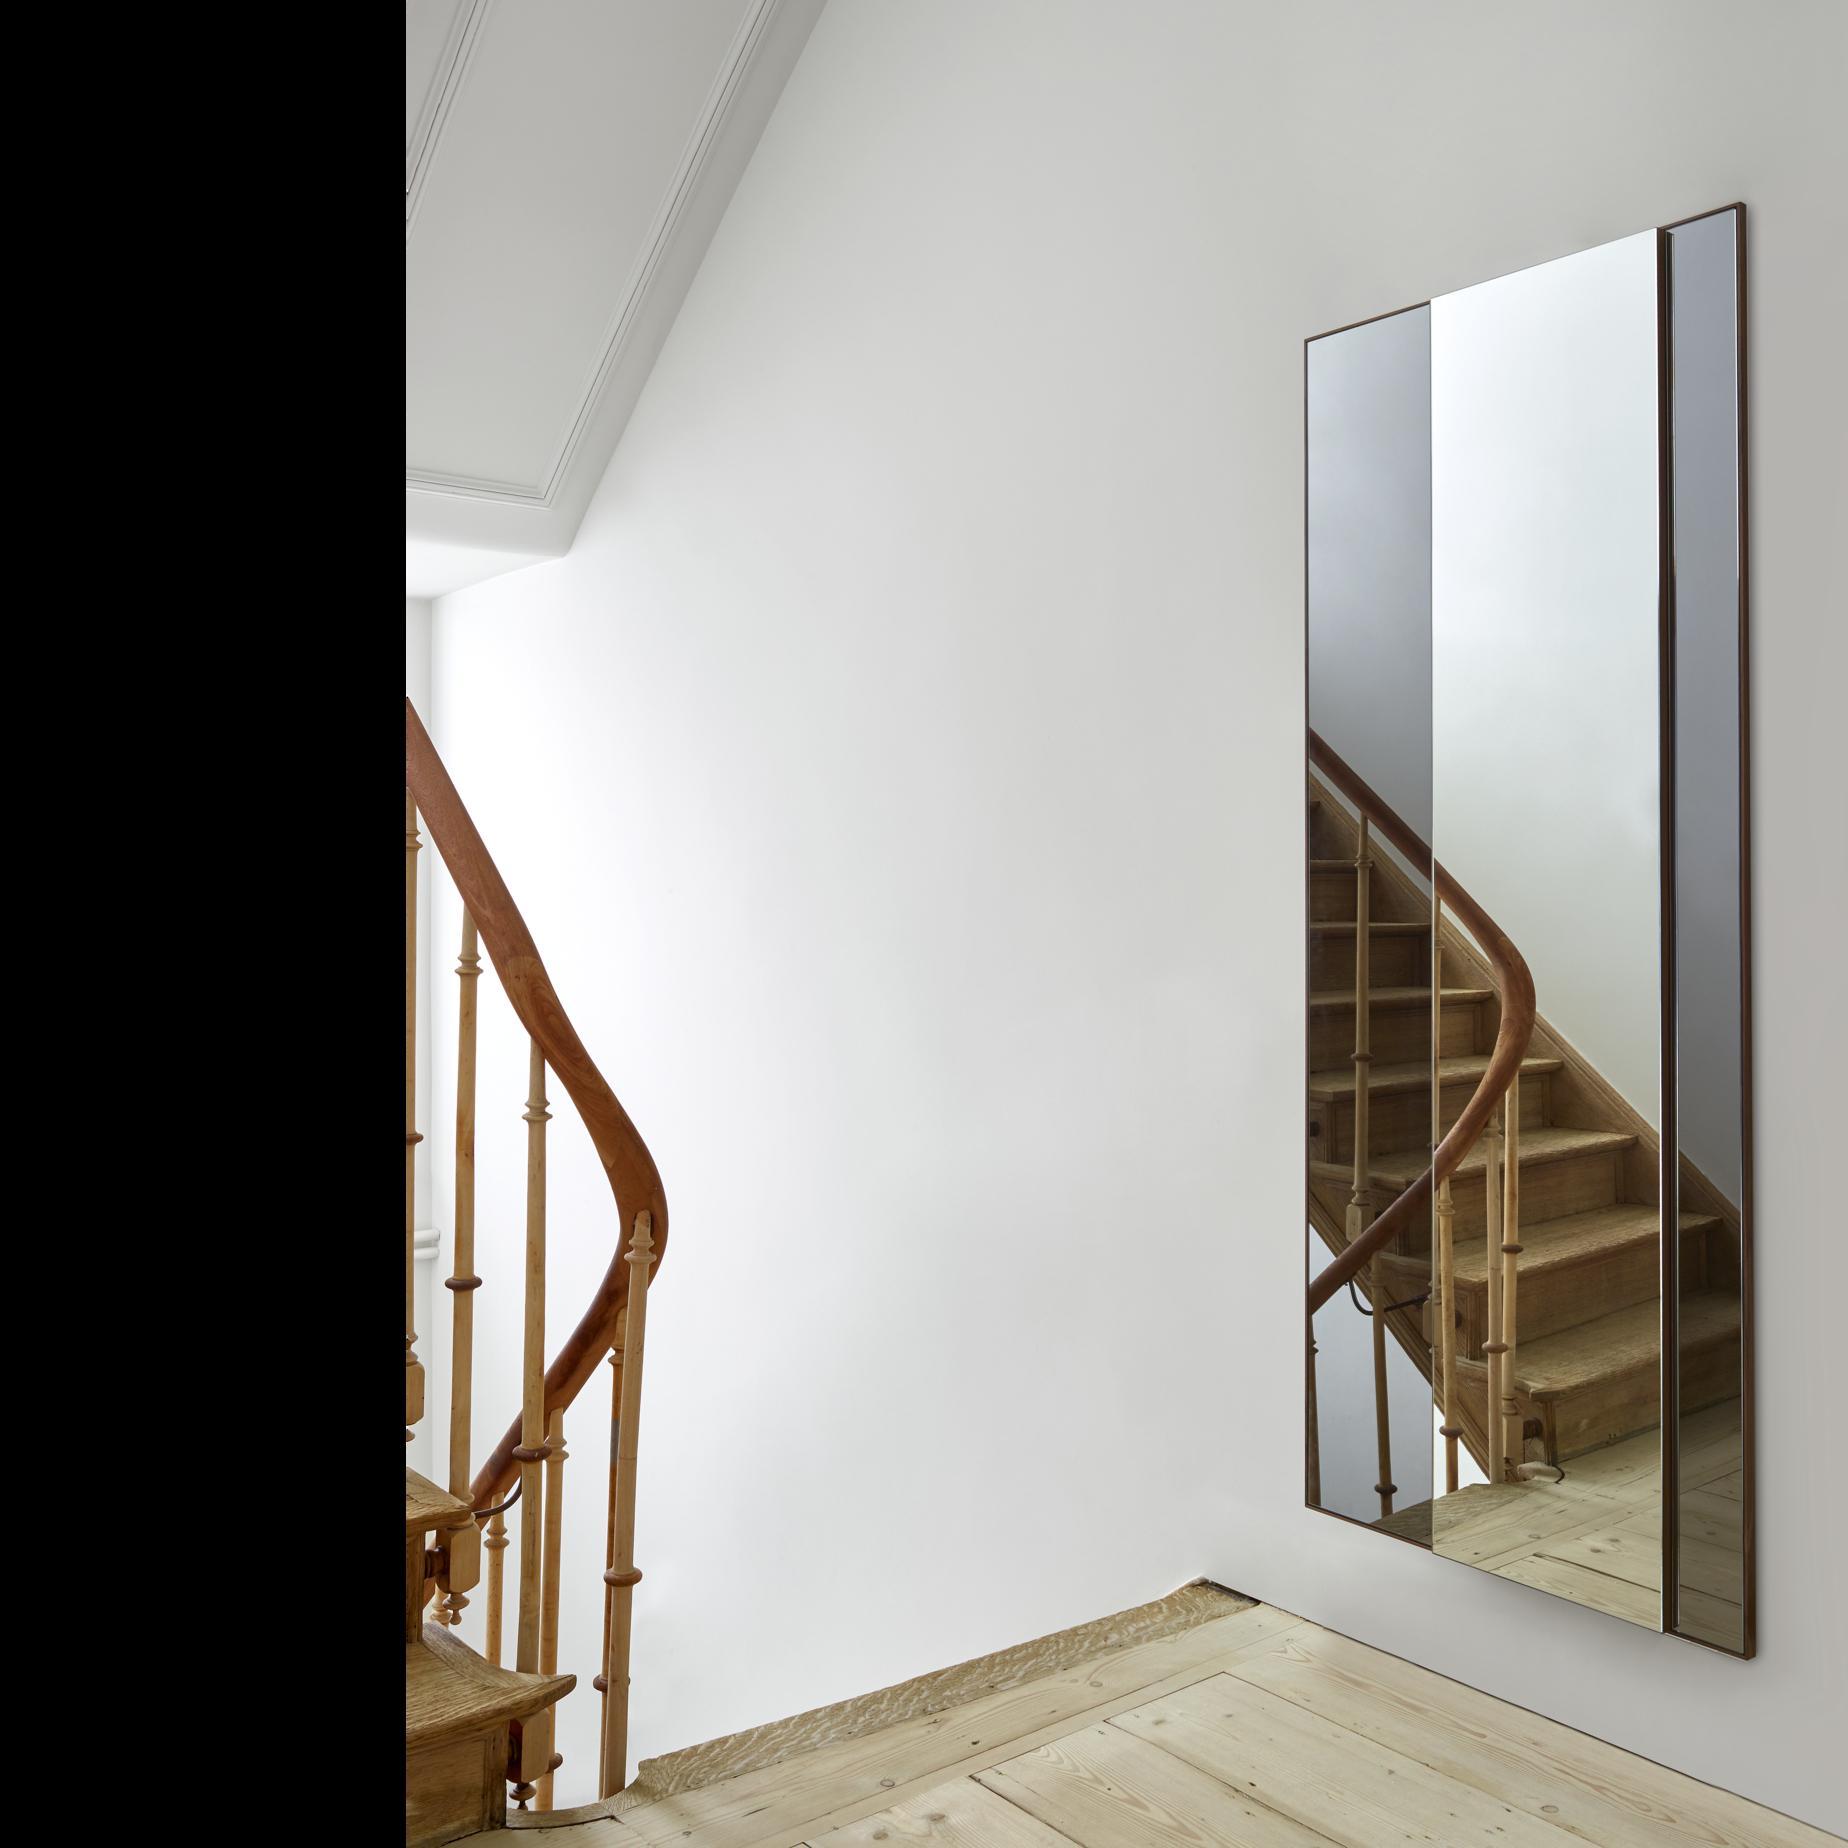 Miroir demi teintes entr e designer marie christine for Cherche grand miroir